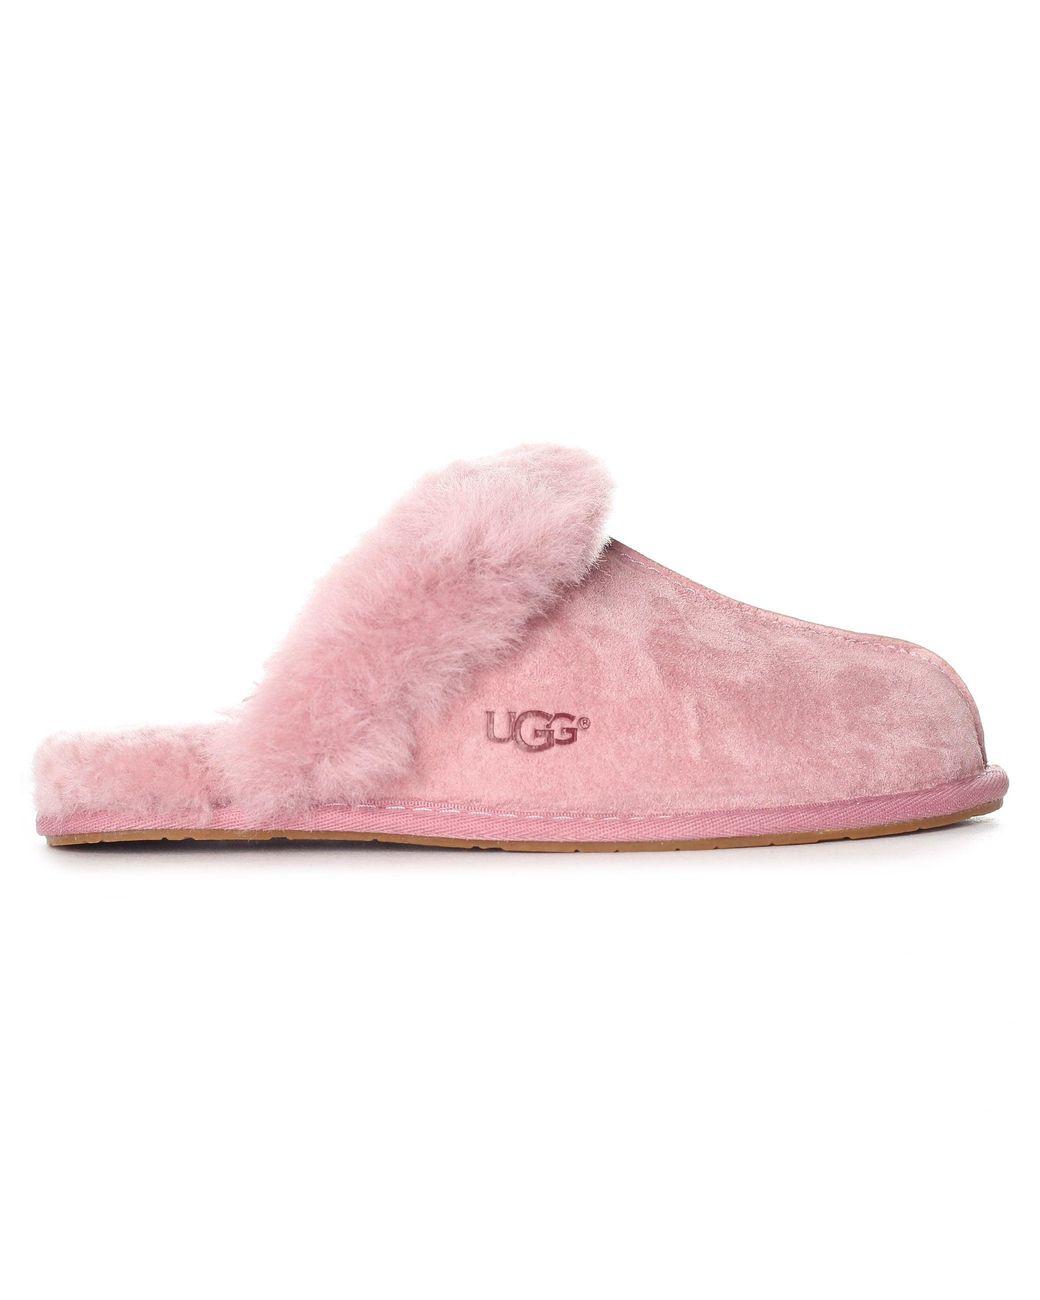 dd843b895 UGG Scuffette Ll Slippers in Pink - Lyst